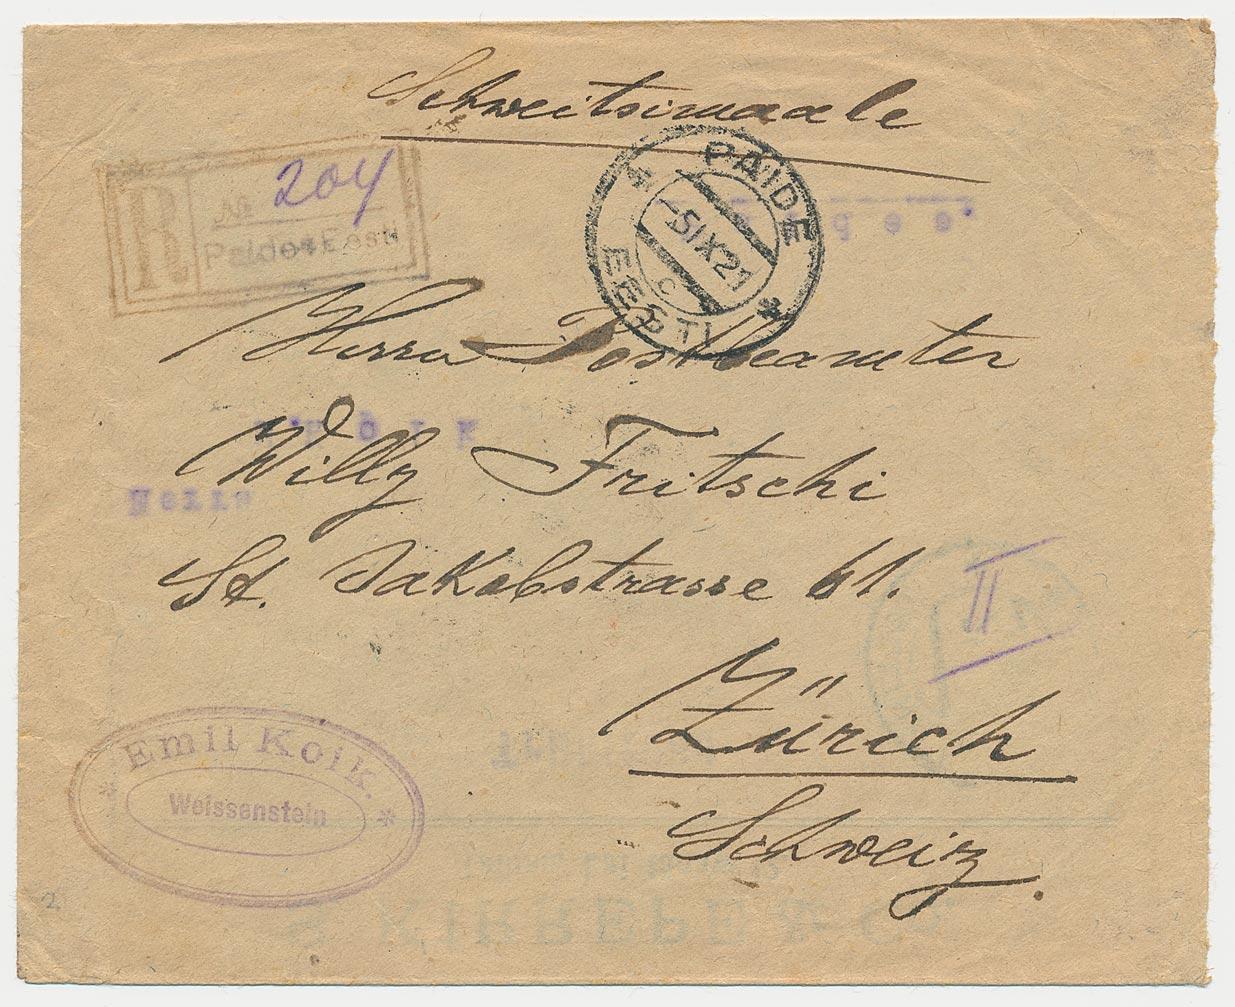 0344a-Paide-Zürich-punane-rist-1921